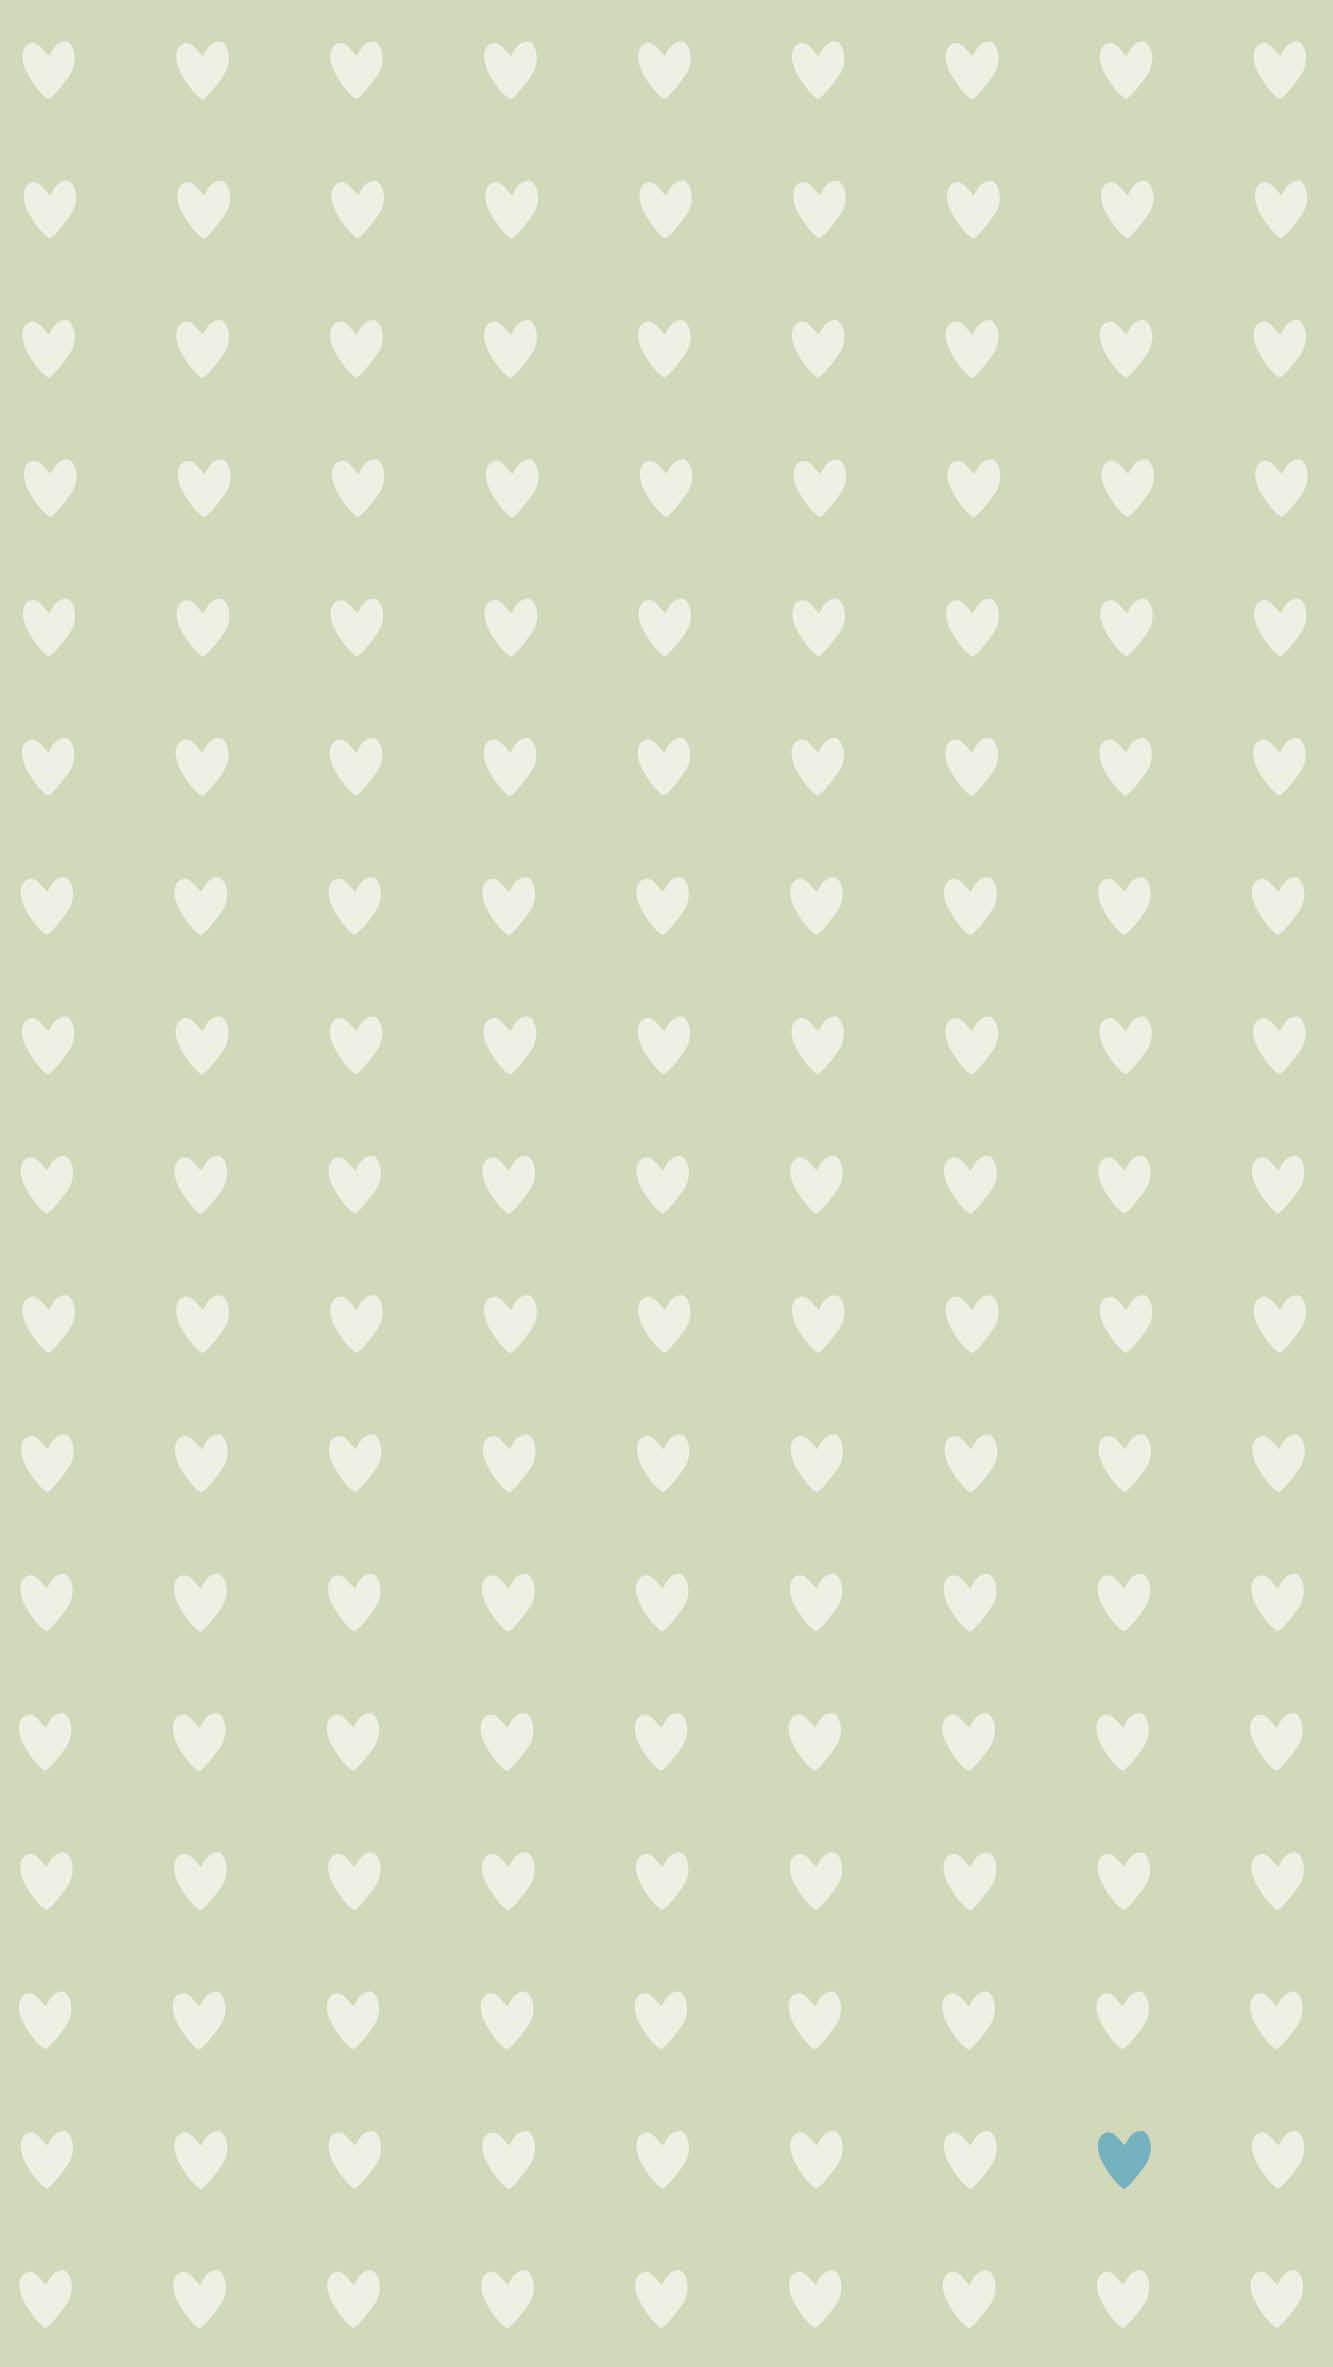 Sage Khaki Mini Hearts Iphone Wallpaper Background Phone Lockscreen Sage Green Wallpaper Heart Iphone Wallpaper Green Wallpaper